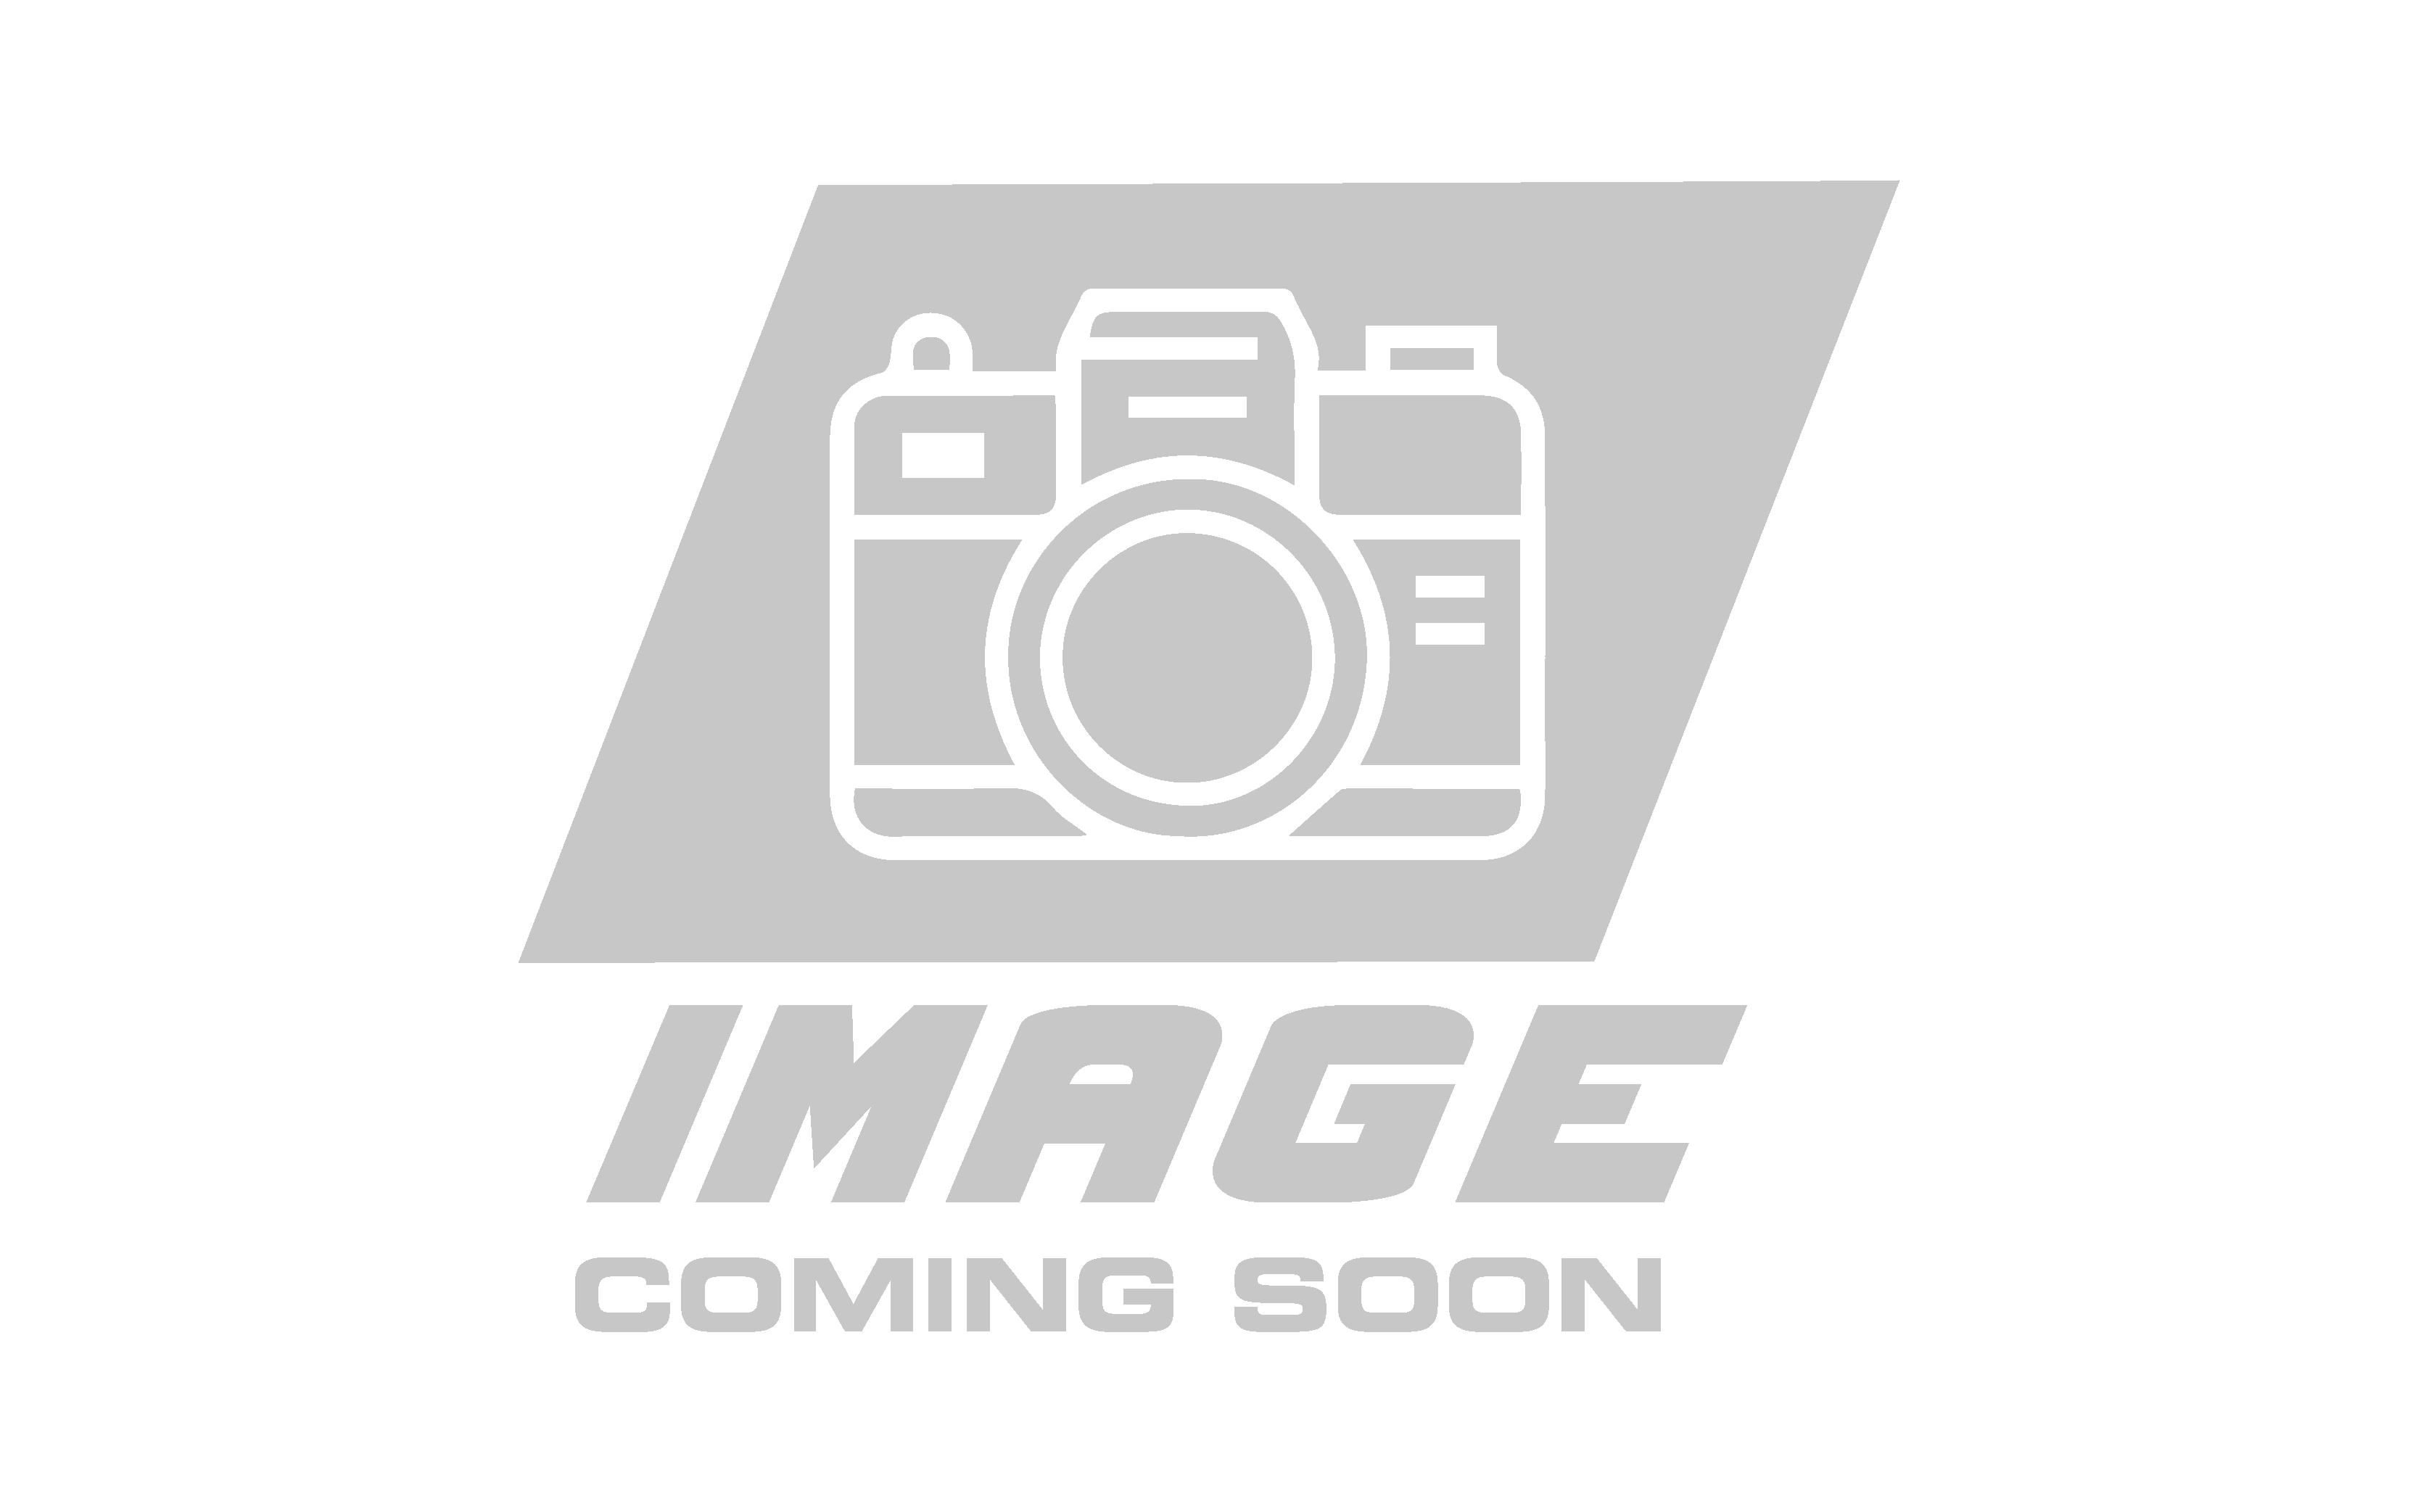 dodge_ram_1500_air_lift_loadlifter_5000_rear_kit_57257